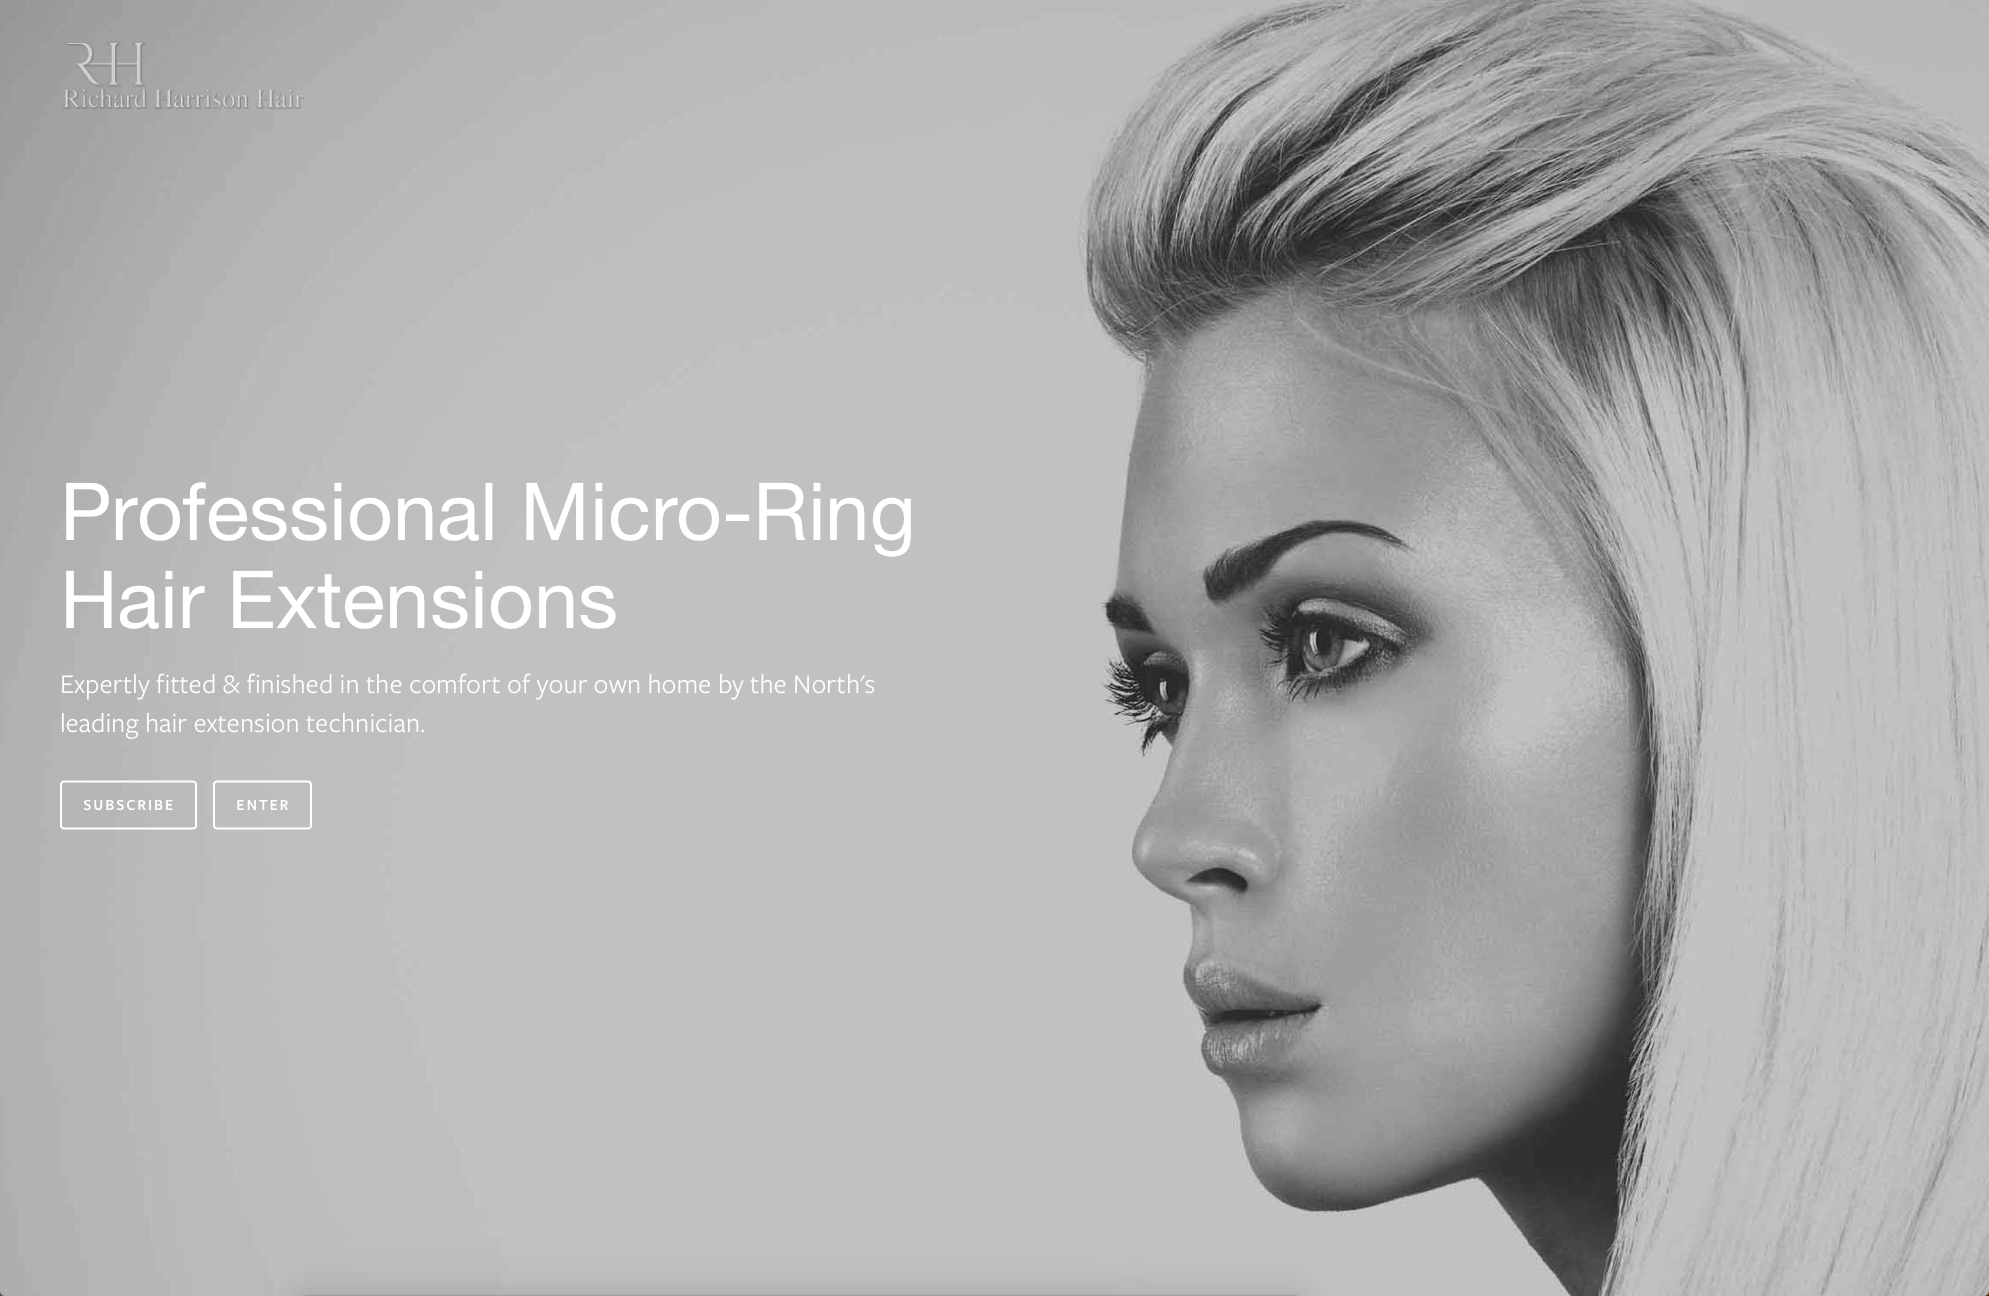 Lithium Design - Small Business Portfolio Richard Harrison Hair 1e